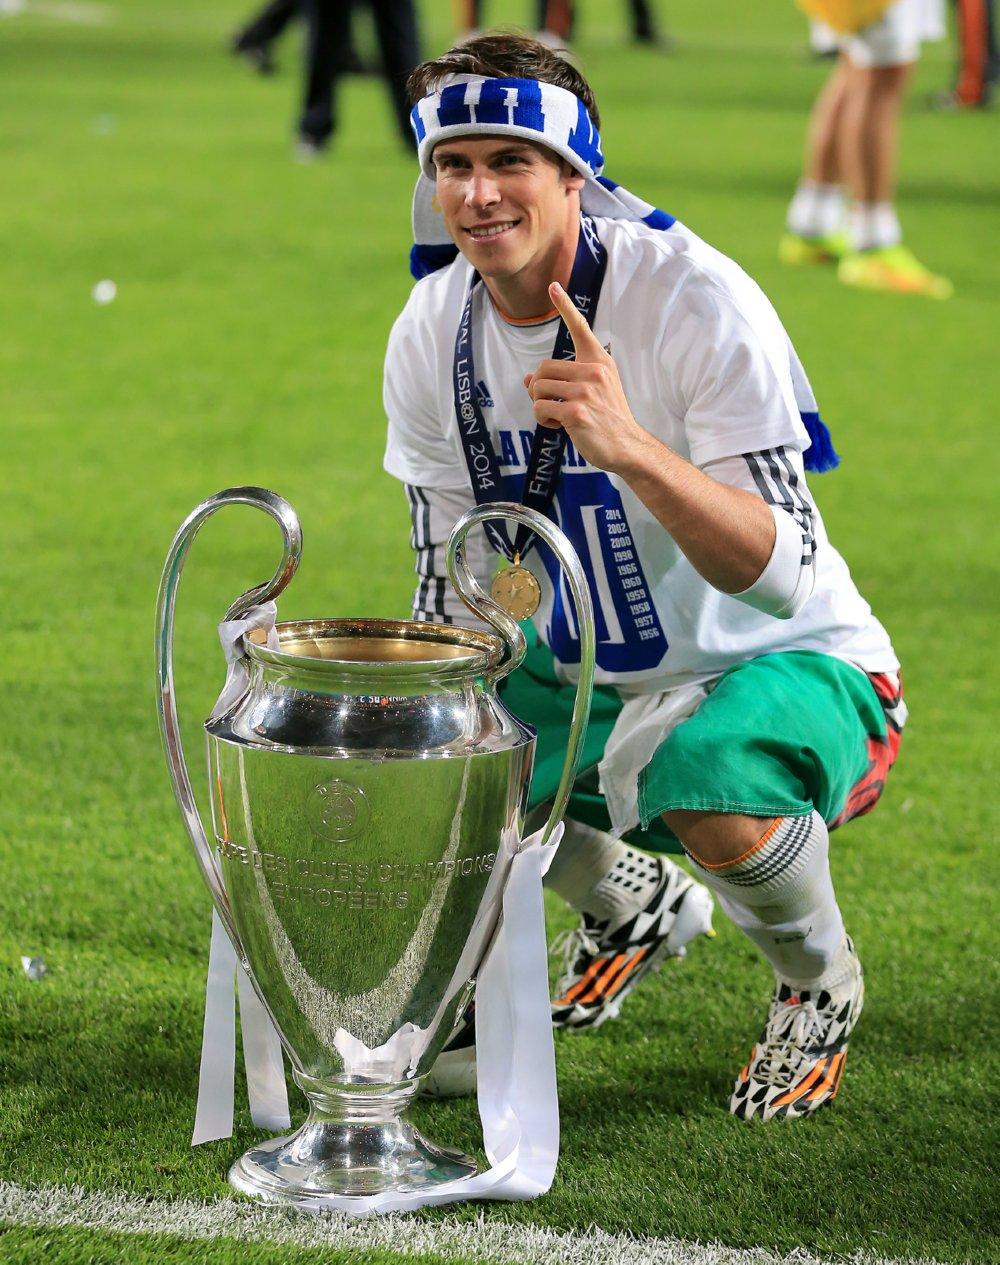 champions league 2014 tore